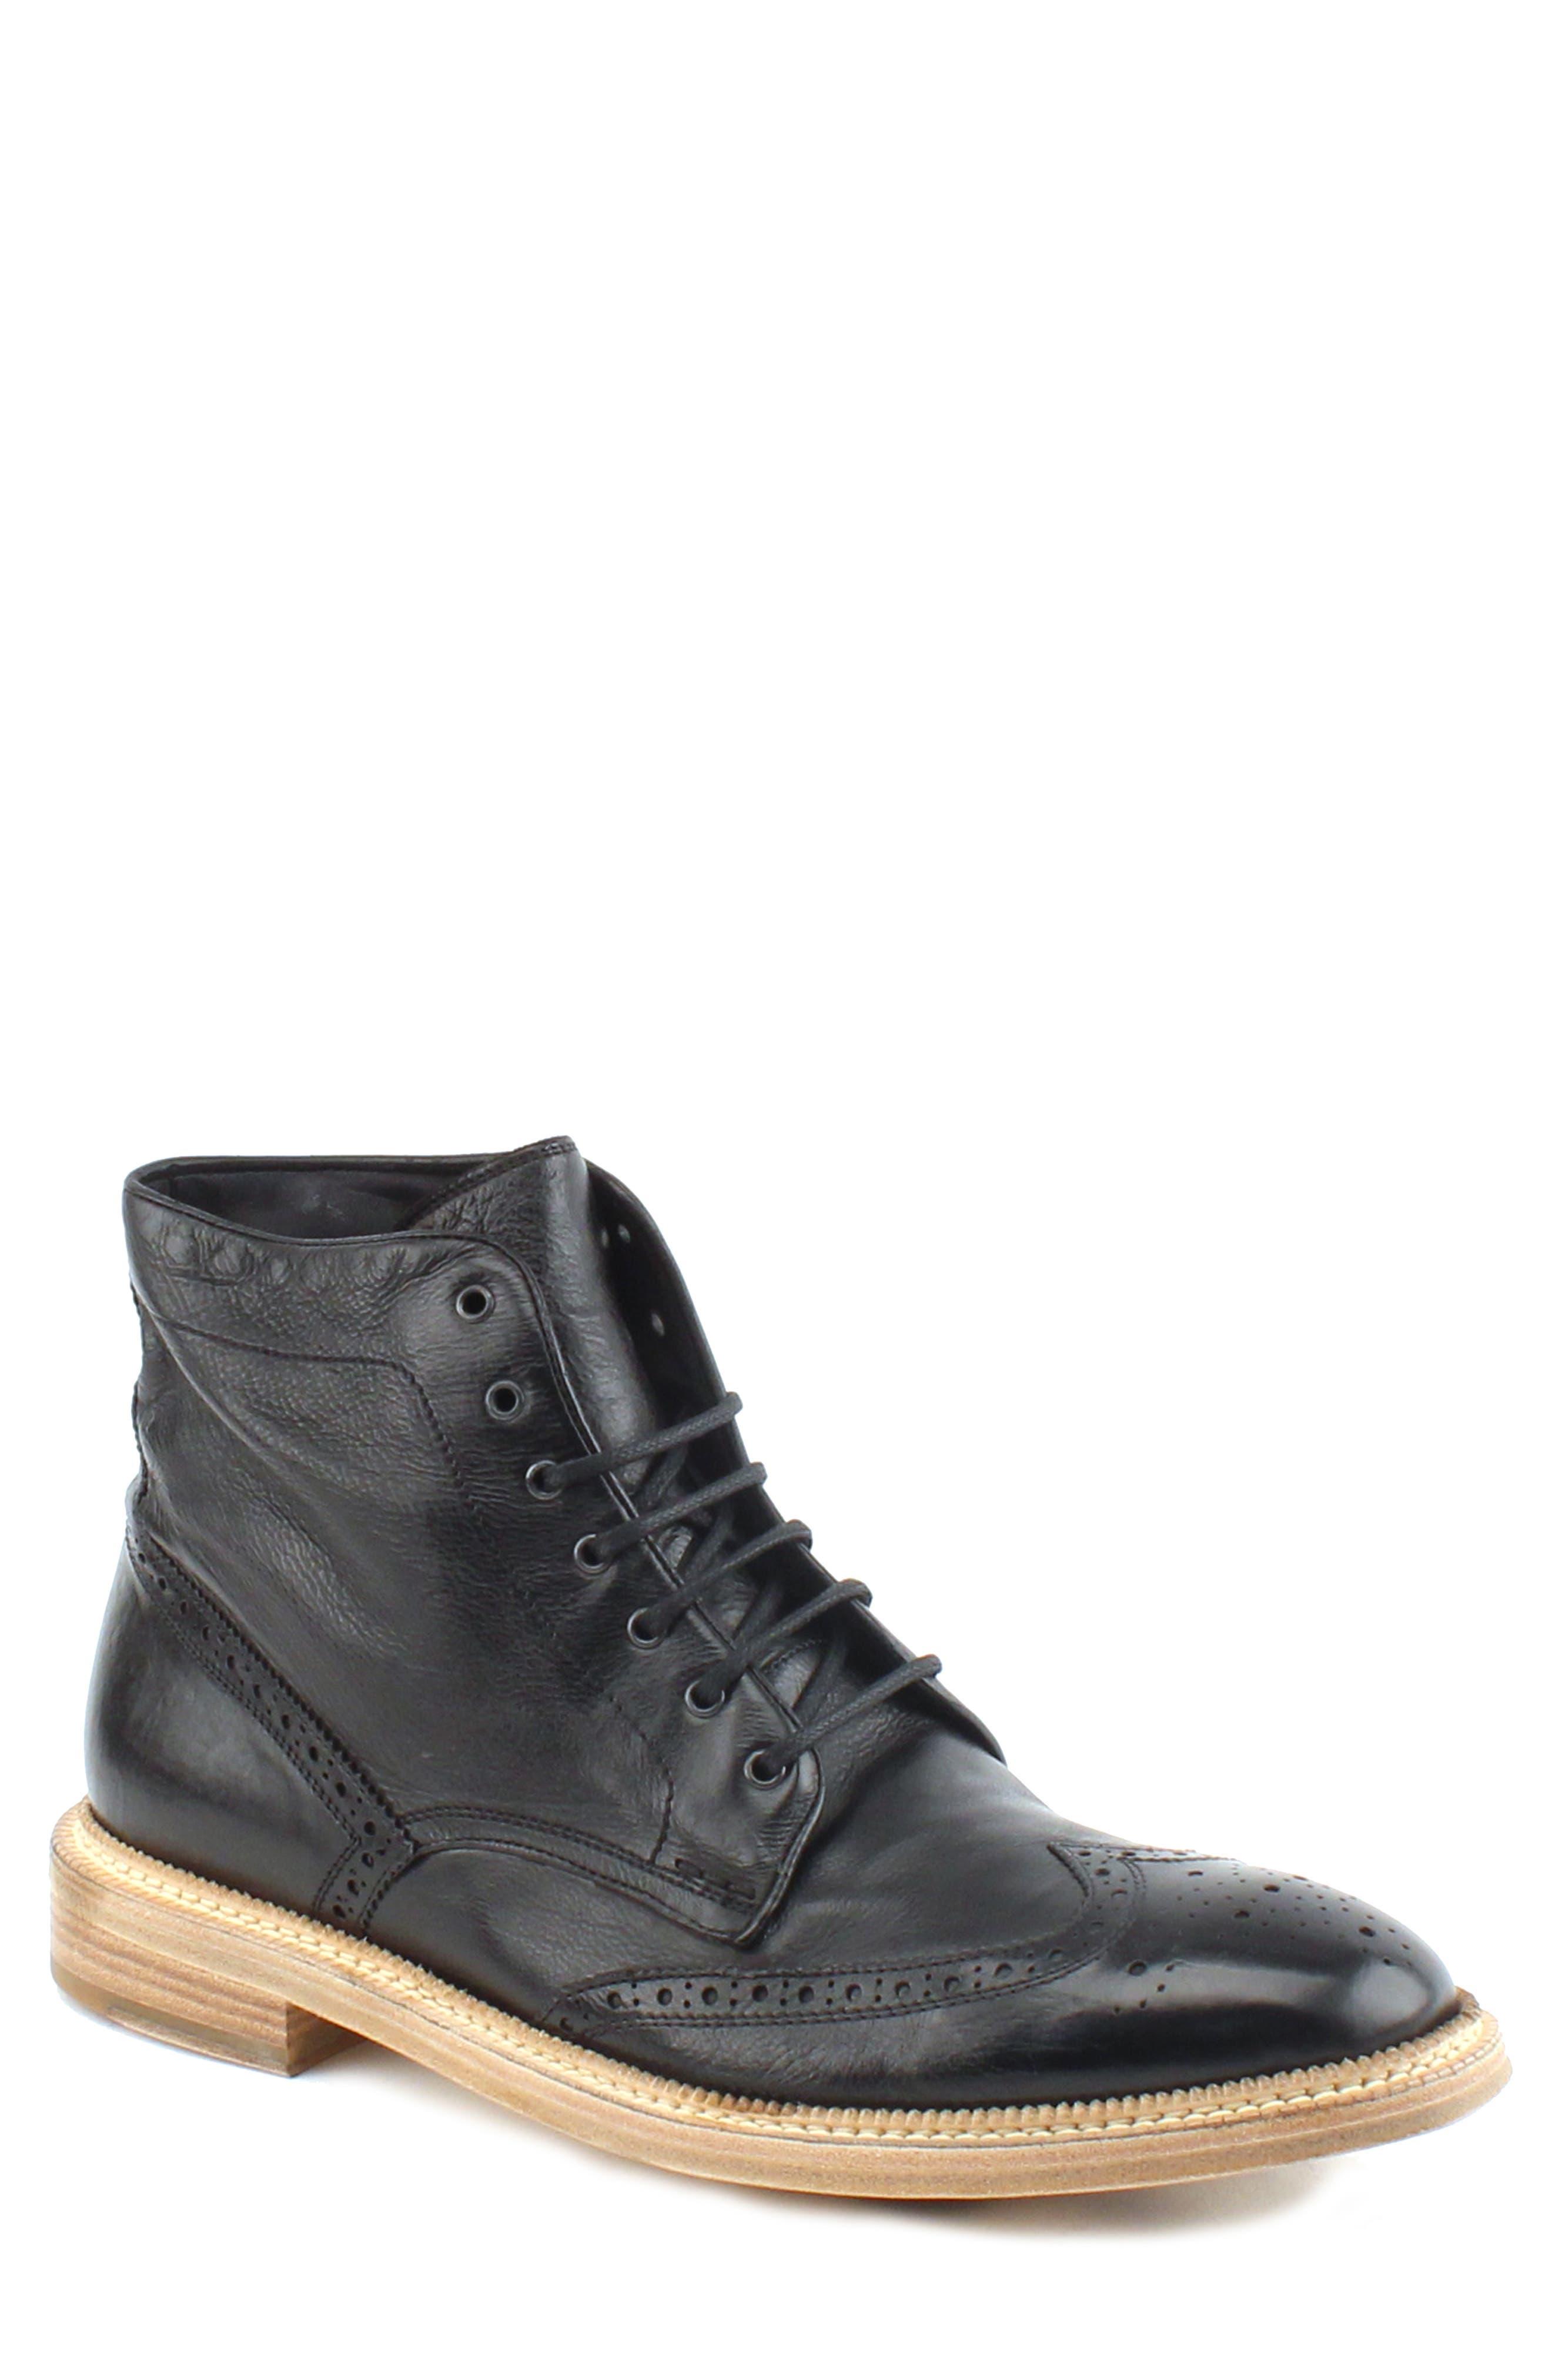 Max Wingtip Boot,                         Main,                         color, 001